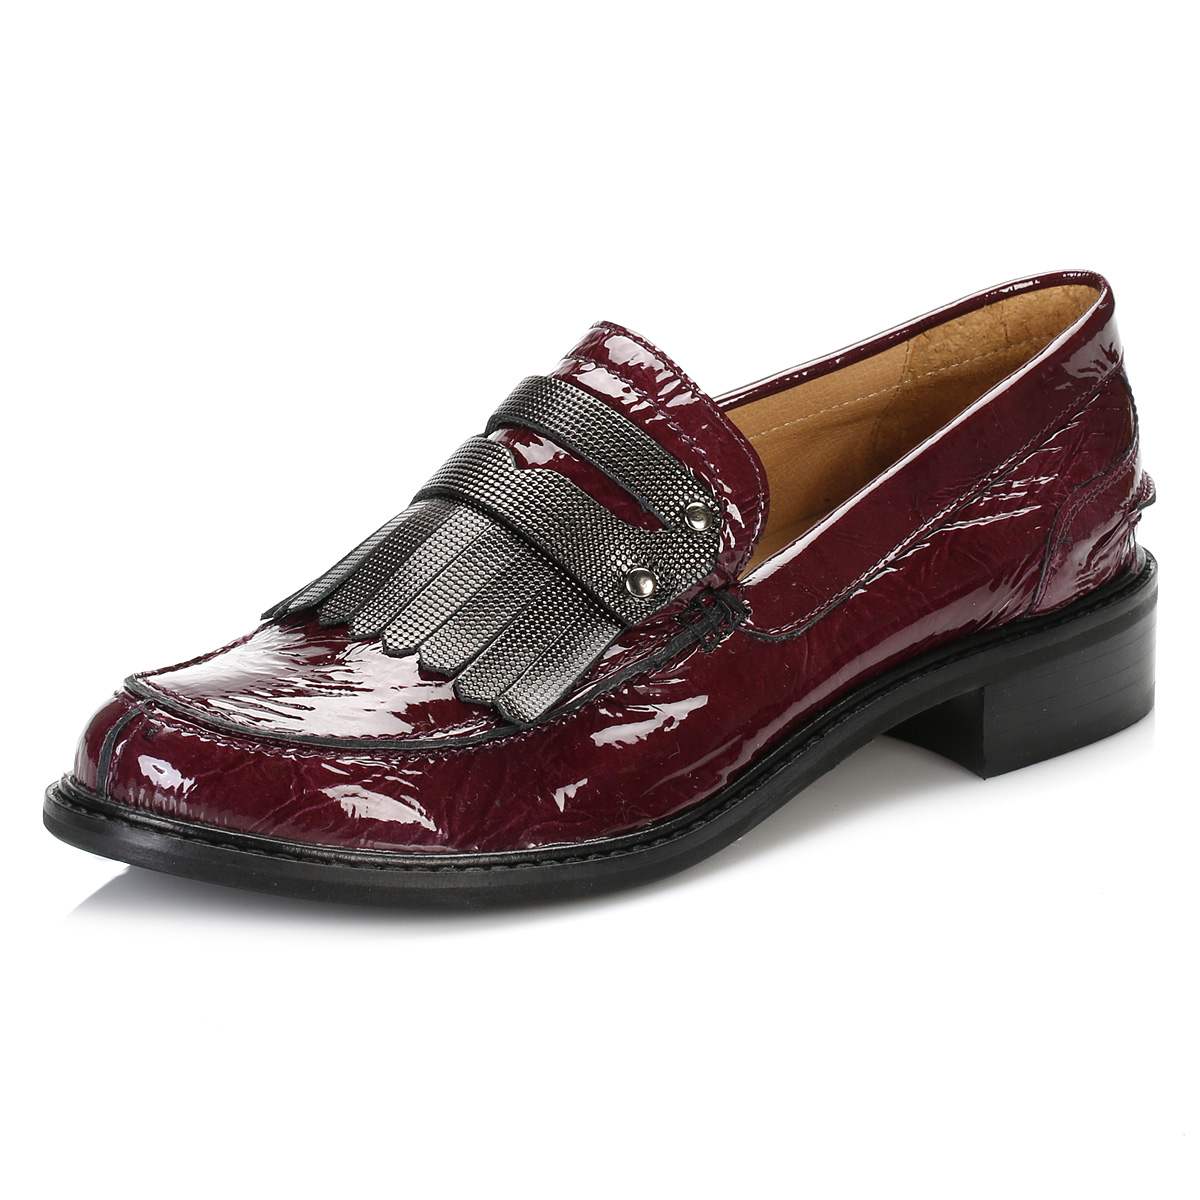 Justin Reece Shoes Ladies